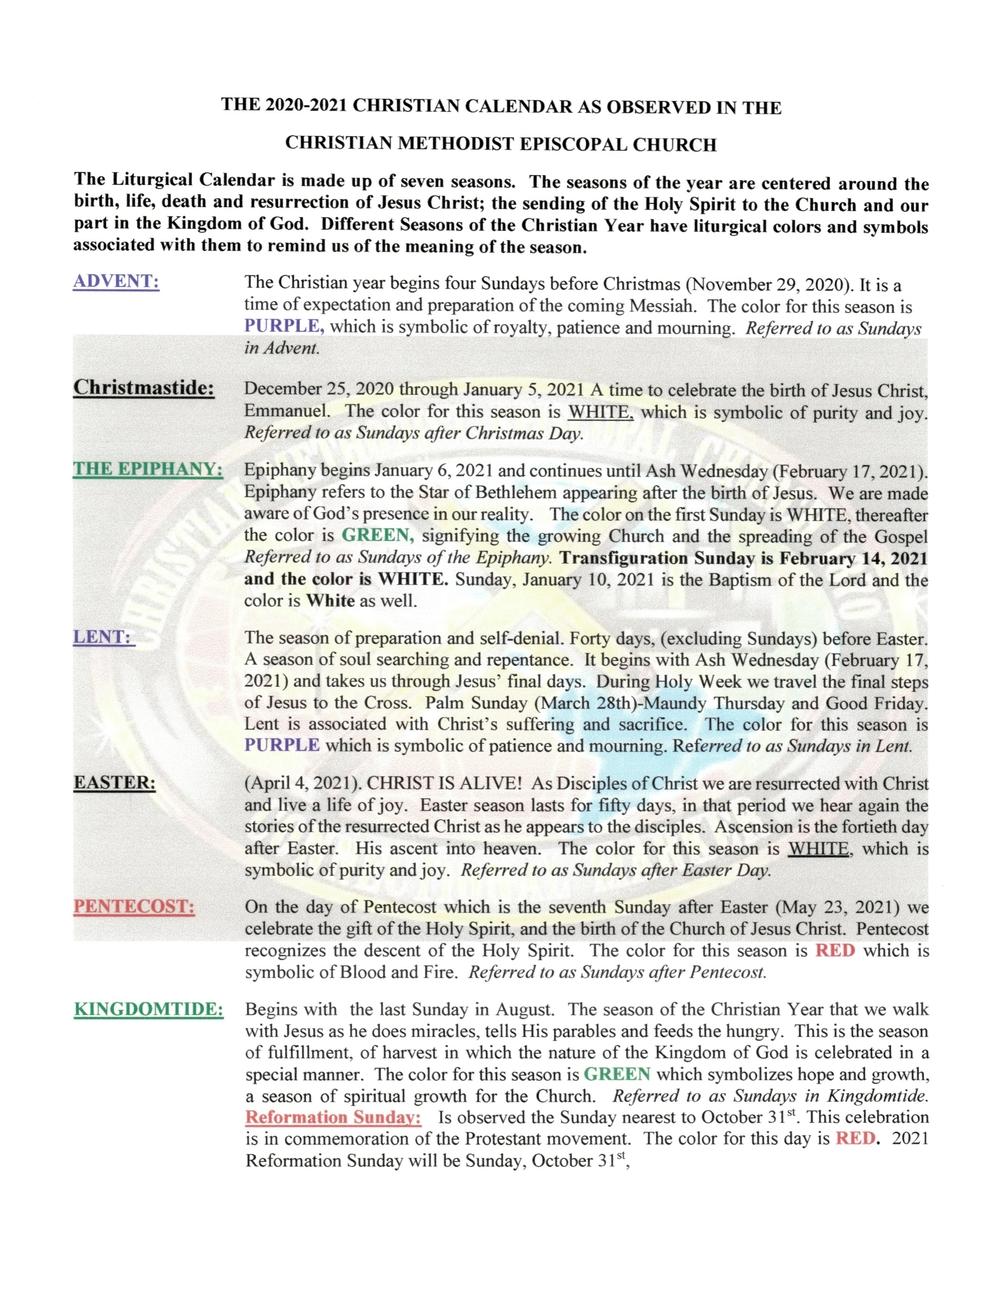 Liturgical Calendar — West End Tabernacle C.m.e. Church  Methodist Liturgical Calendar 2021